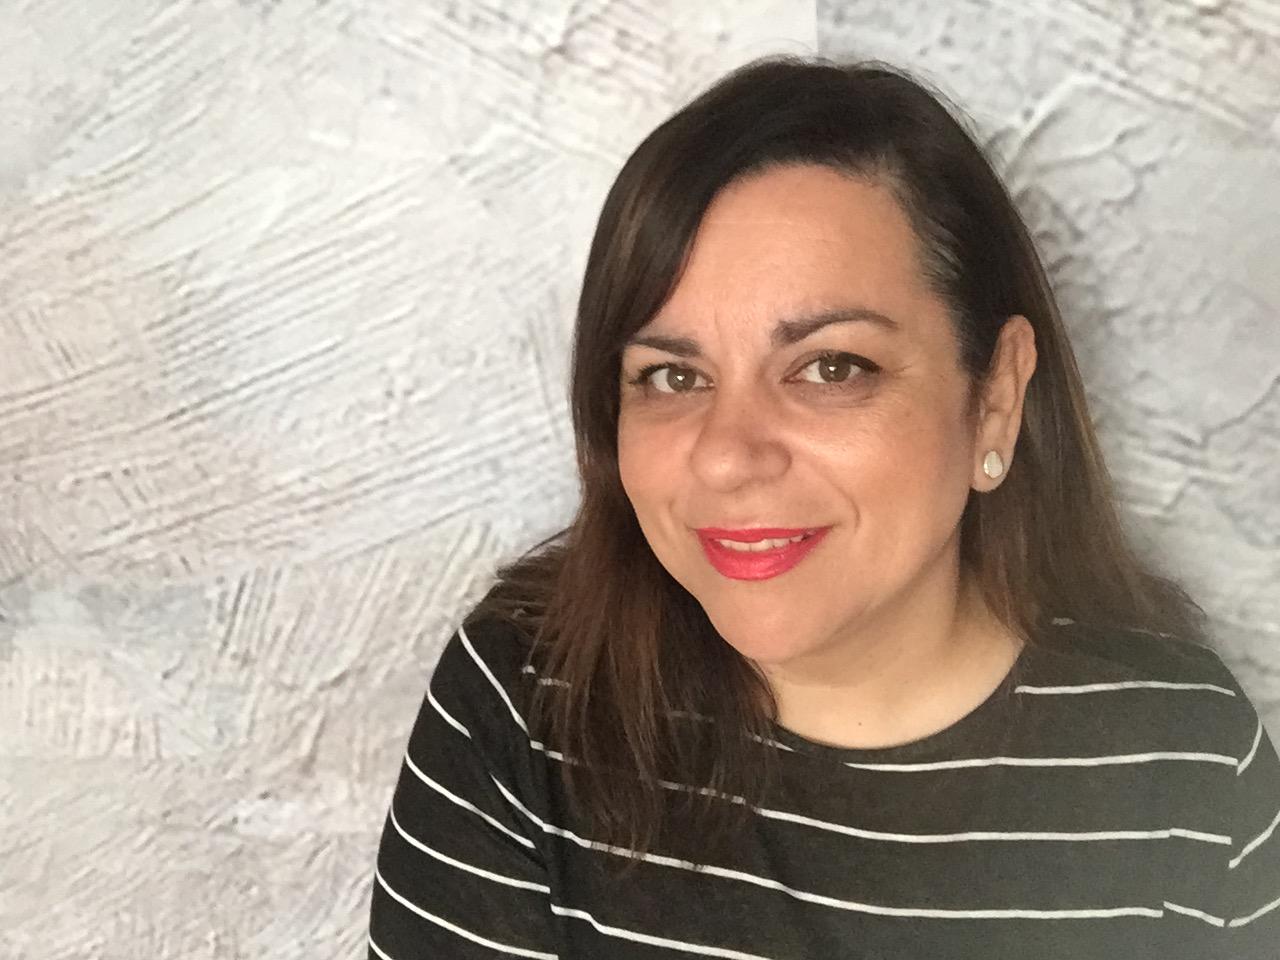 Ana Sedeño